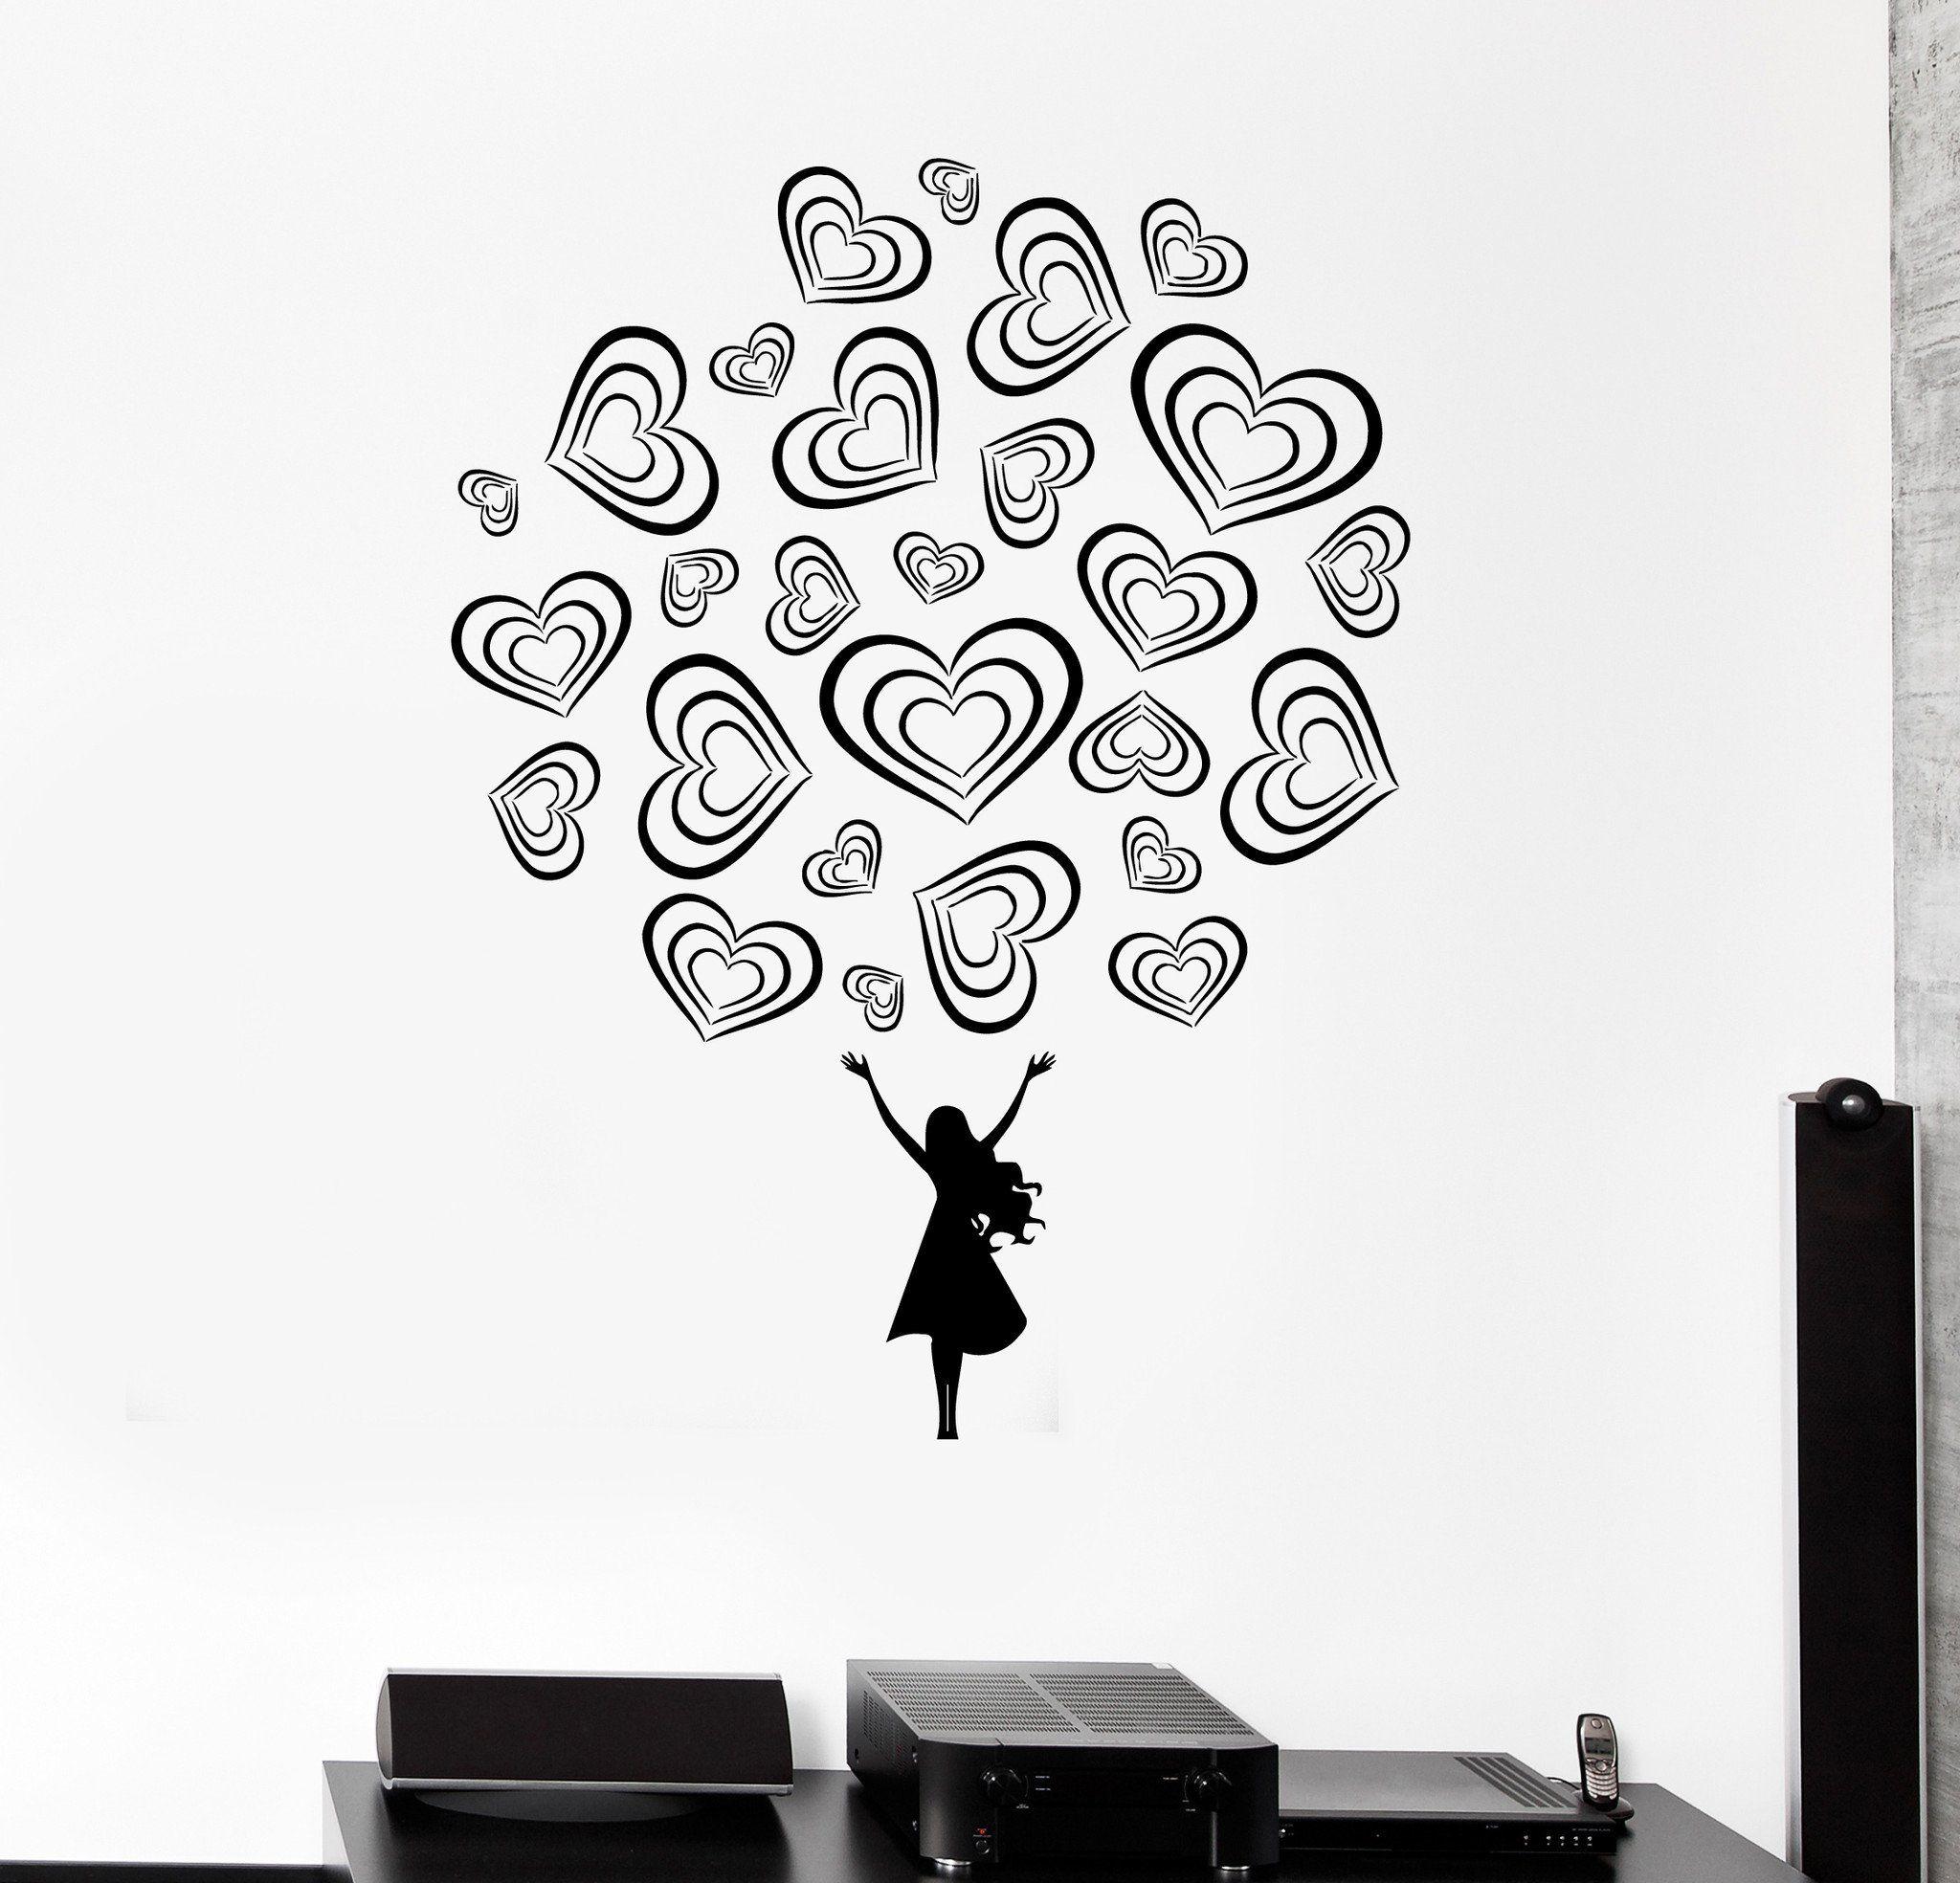 Wall decal teen girl love romance beautiful decor vinyl stickers